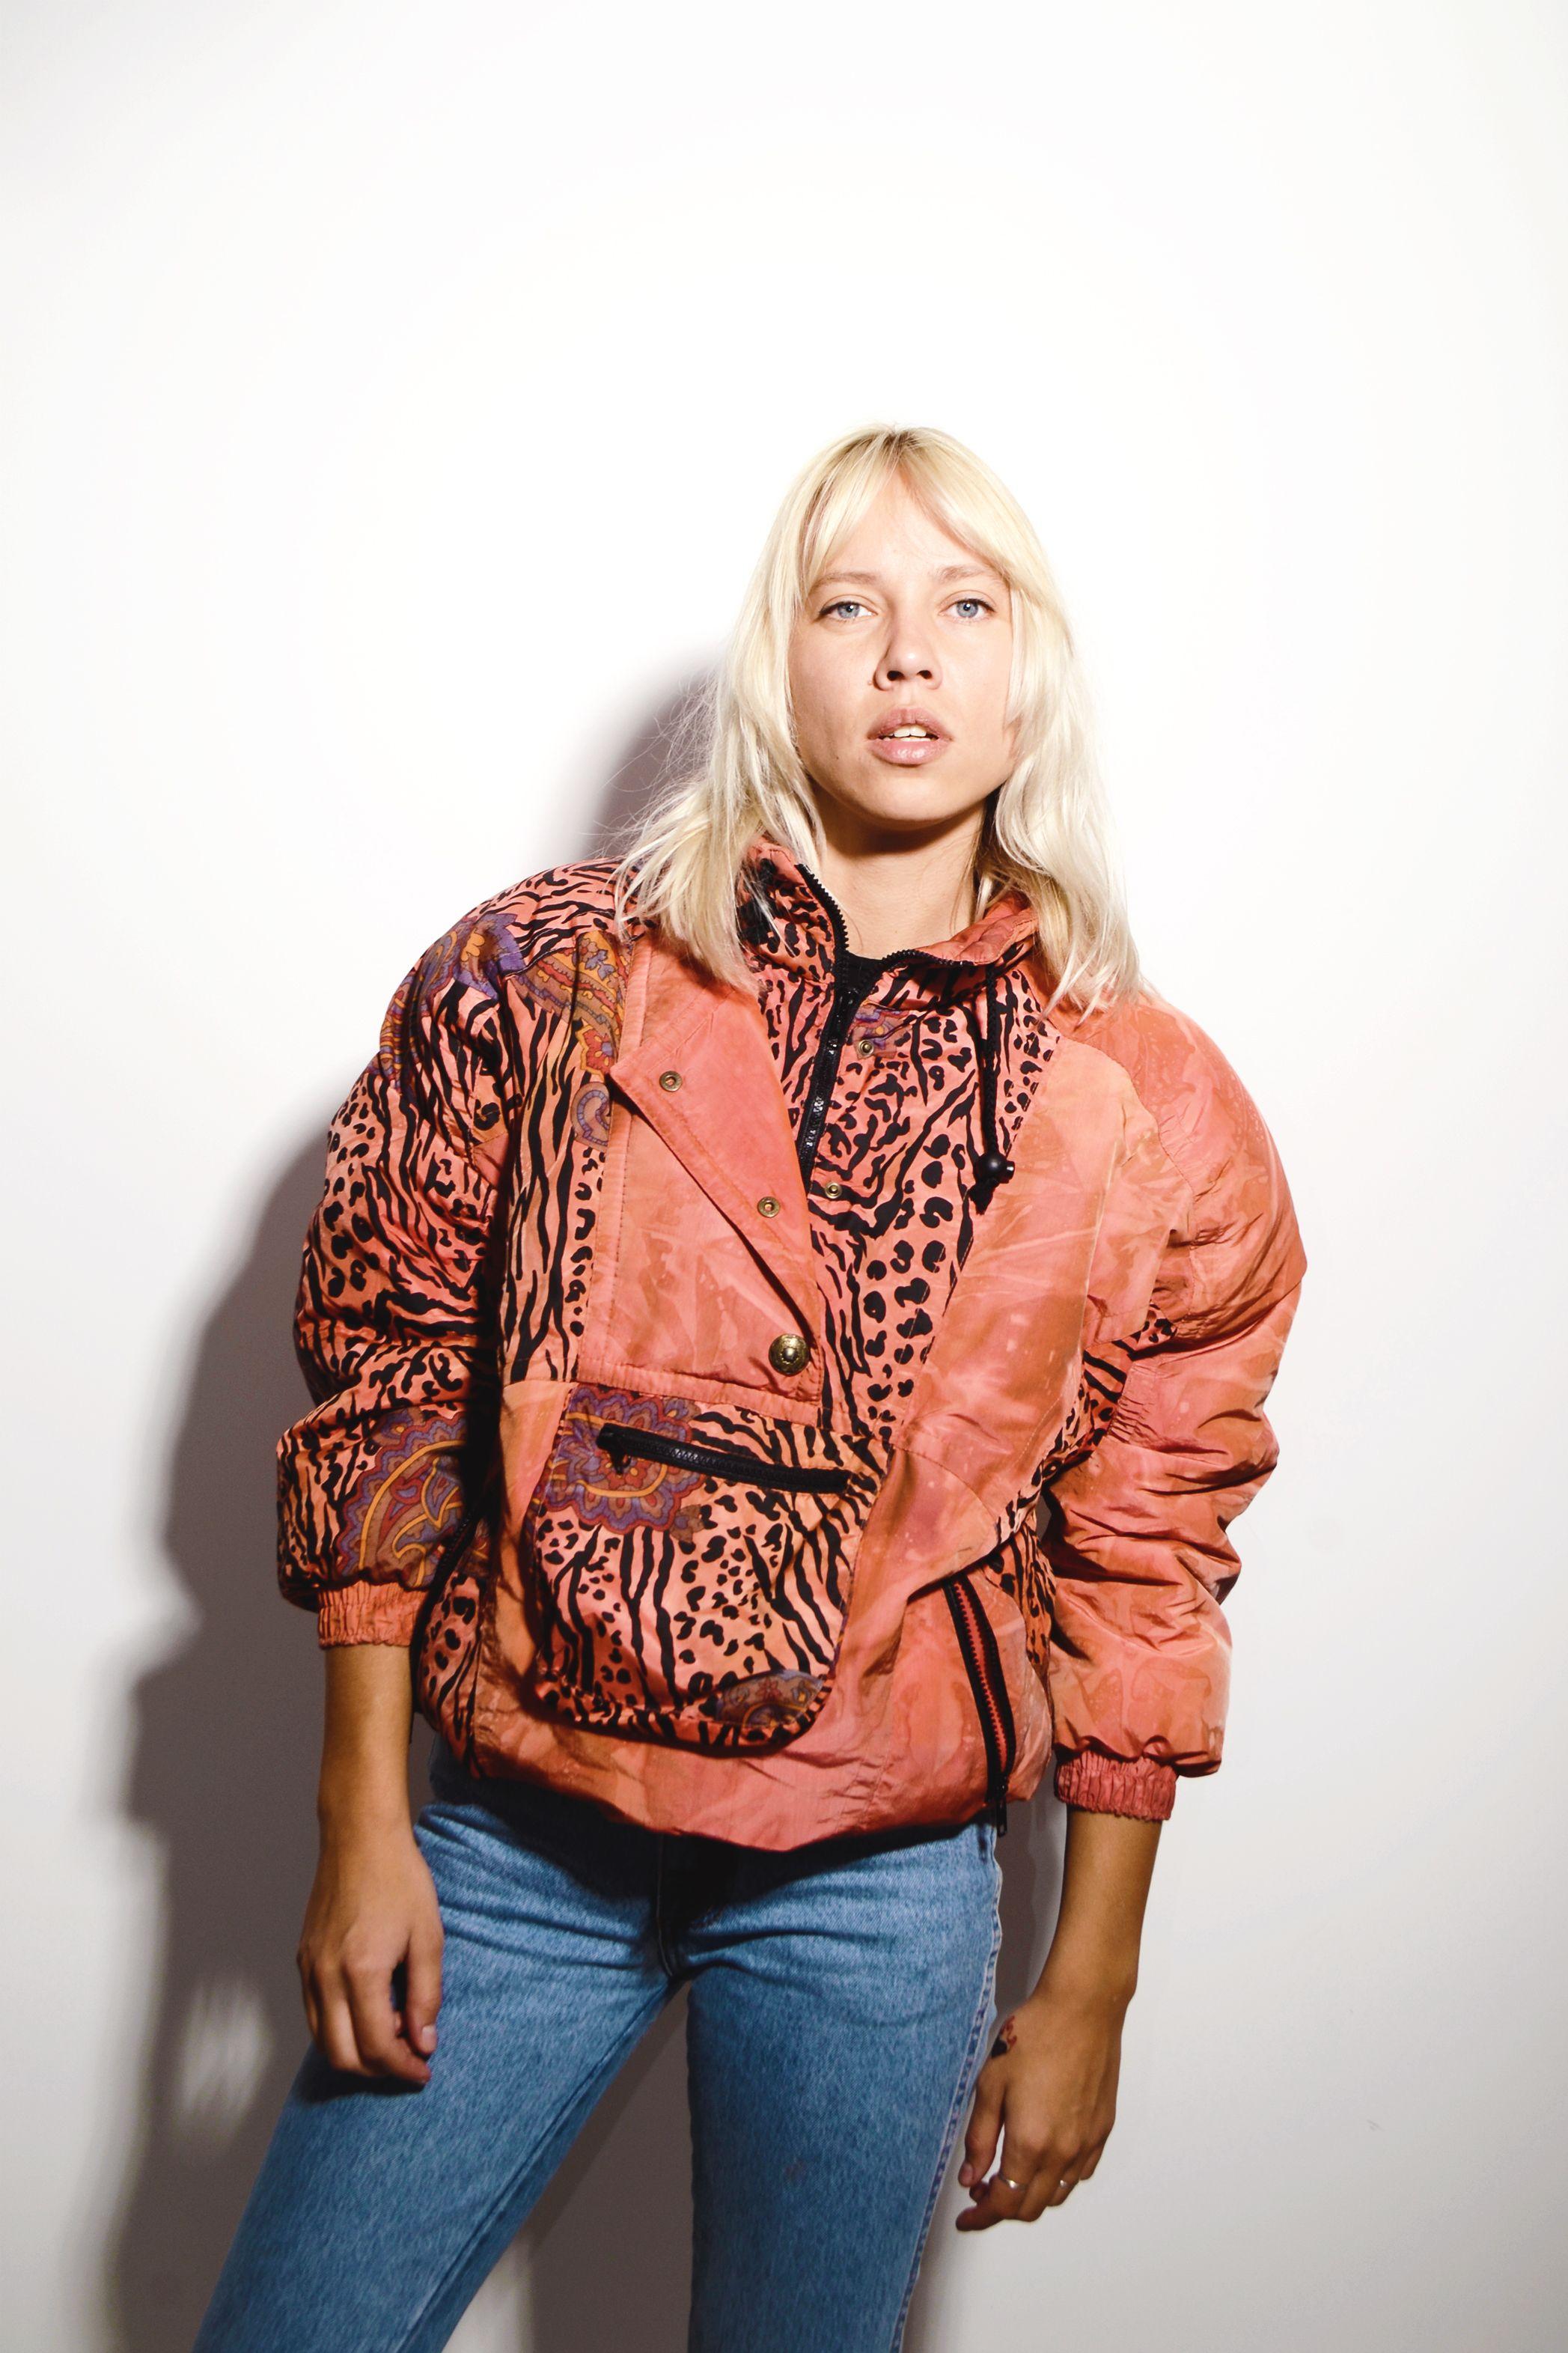 Vintage 90s Ski Jacket In Orange For Women Old School Fashion Streetwear Clothing Retro Old School Fashion Vintage Clothing Online School Fashion